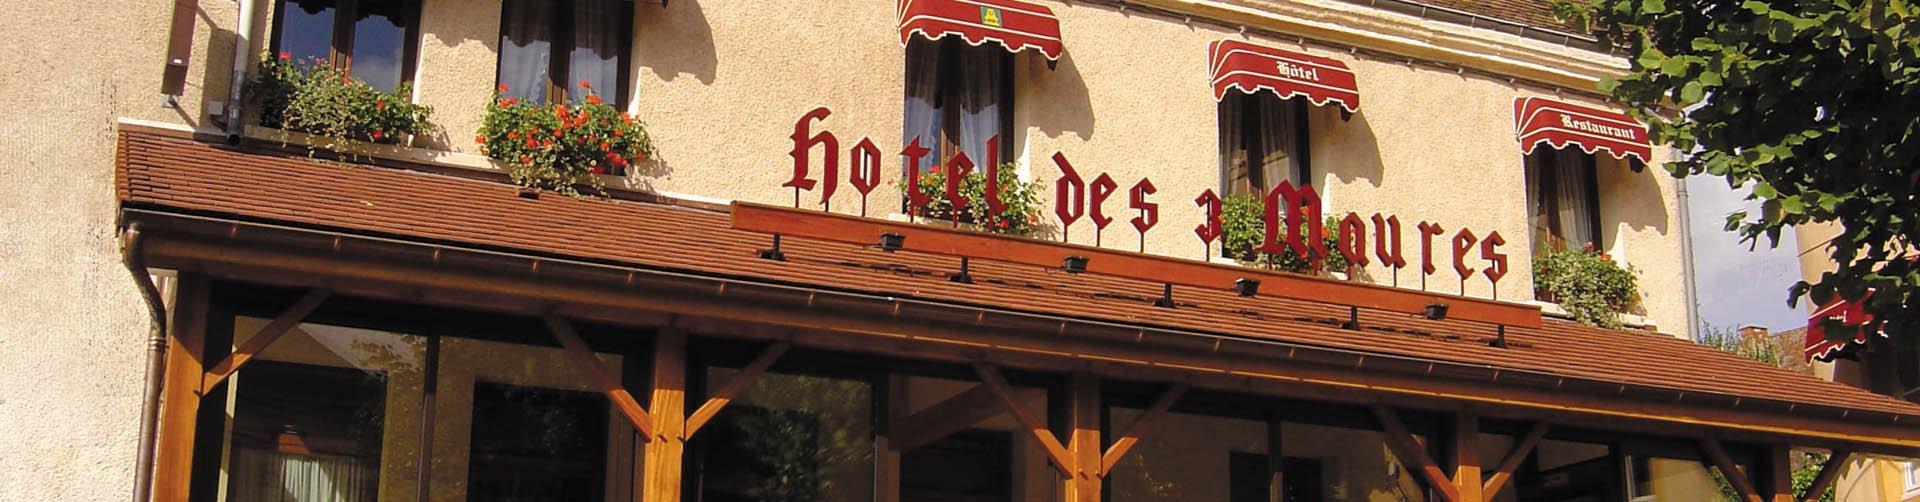 Hotel Des Trois Maures - banner